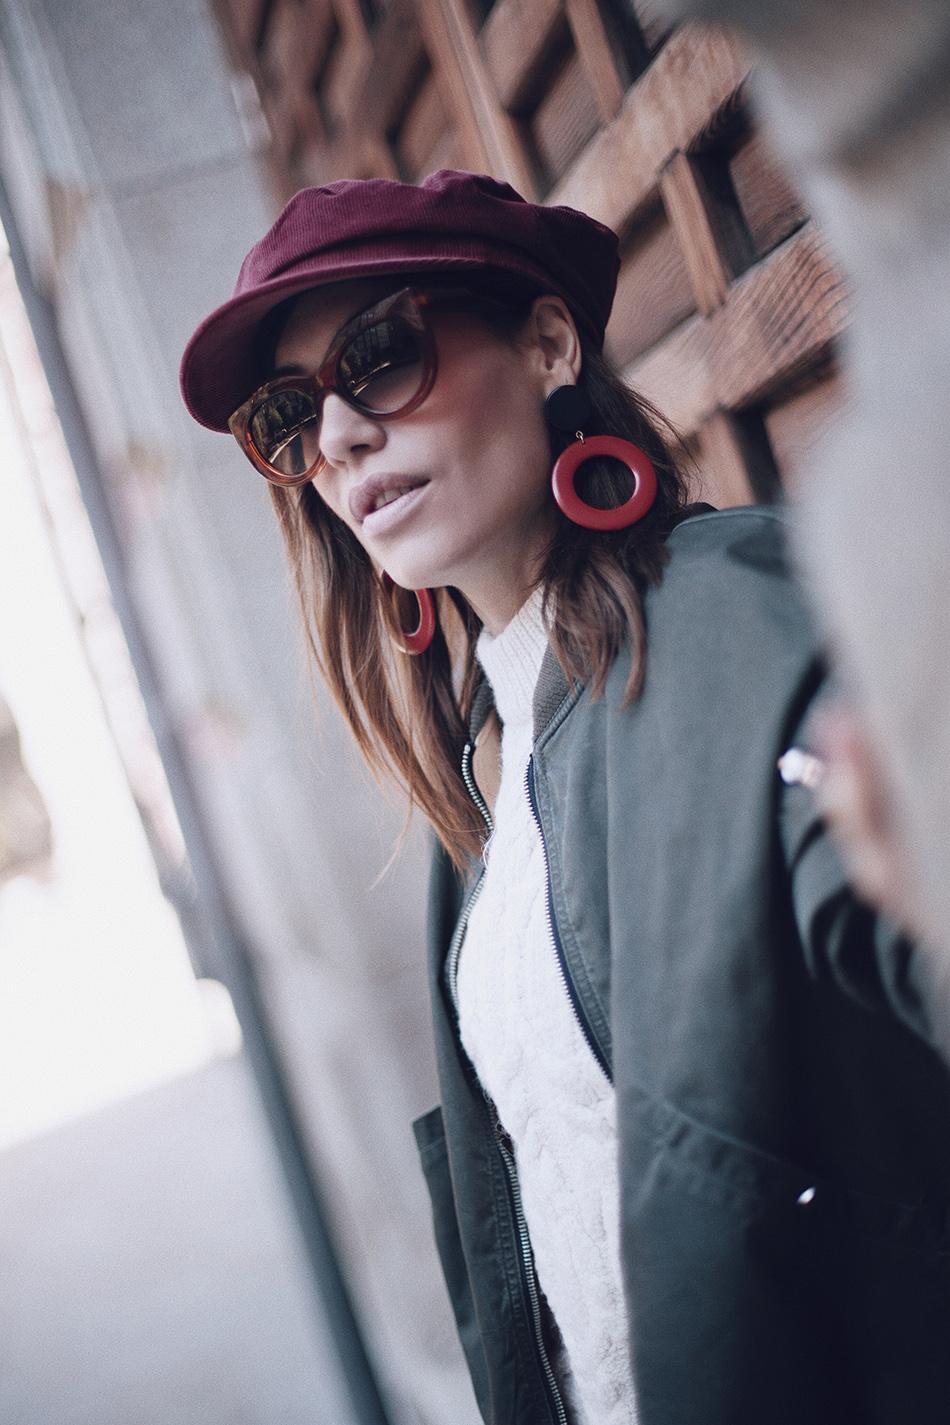 Bárbara Crespo street style / Bomber jacket / Chaqueta bomber: Zara. Jersey / Pullover: Kiabi Jeans:Reiko Botas / Boots: Mango Pendientes / Earrings: Mango Bolso / Bag: Michael Kors Gafas de sol / Sunglasses: Mango Cap / Gorra marinera: Mango